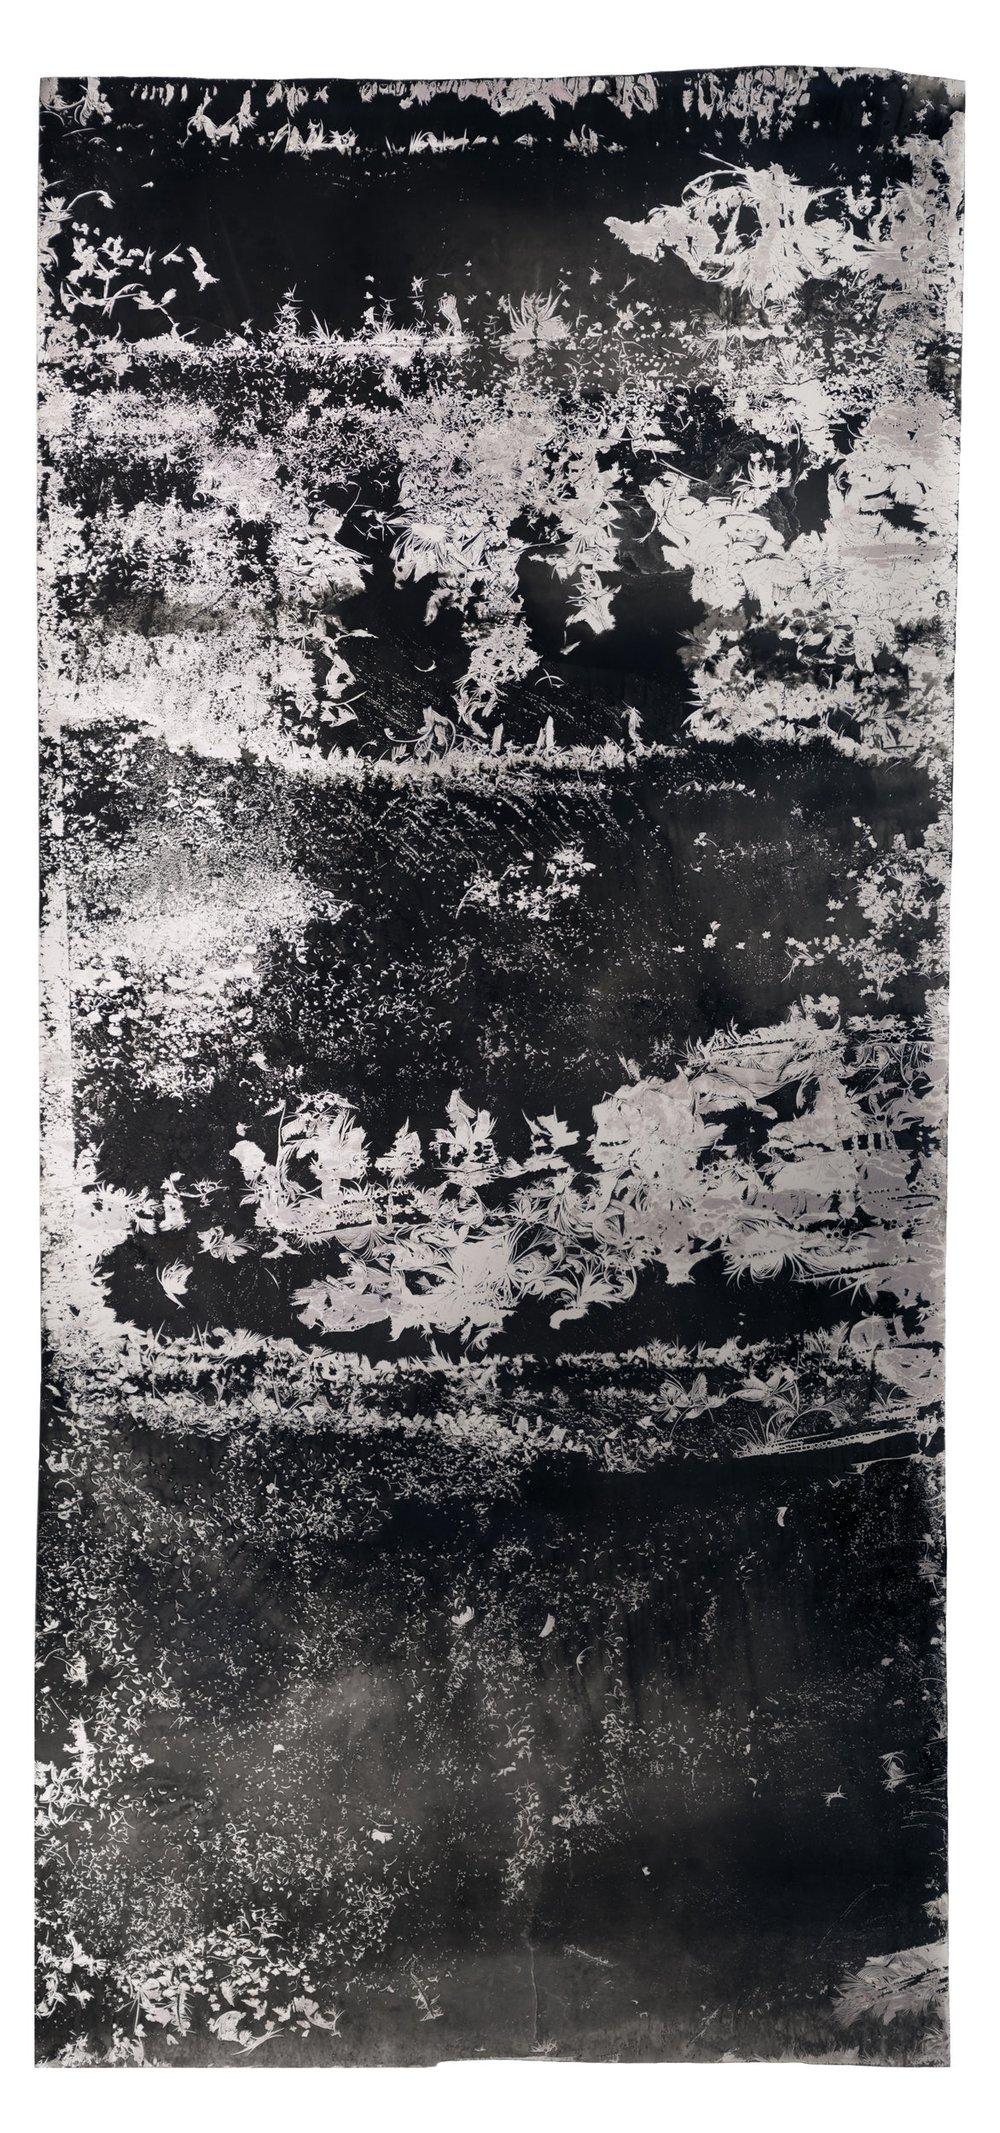 Ice Moon I , 2018, 10.66 feet x 3.5 feet, Silver Gelatin Print